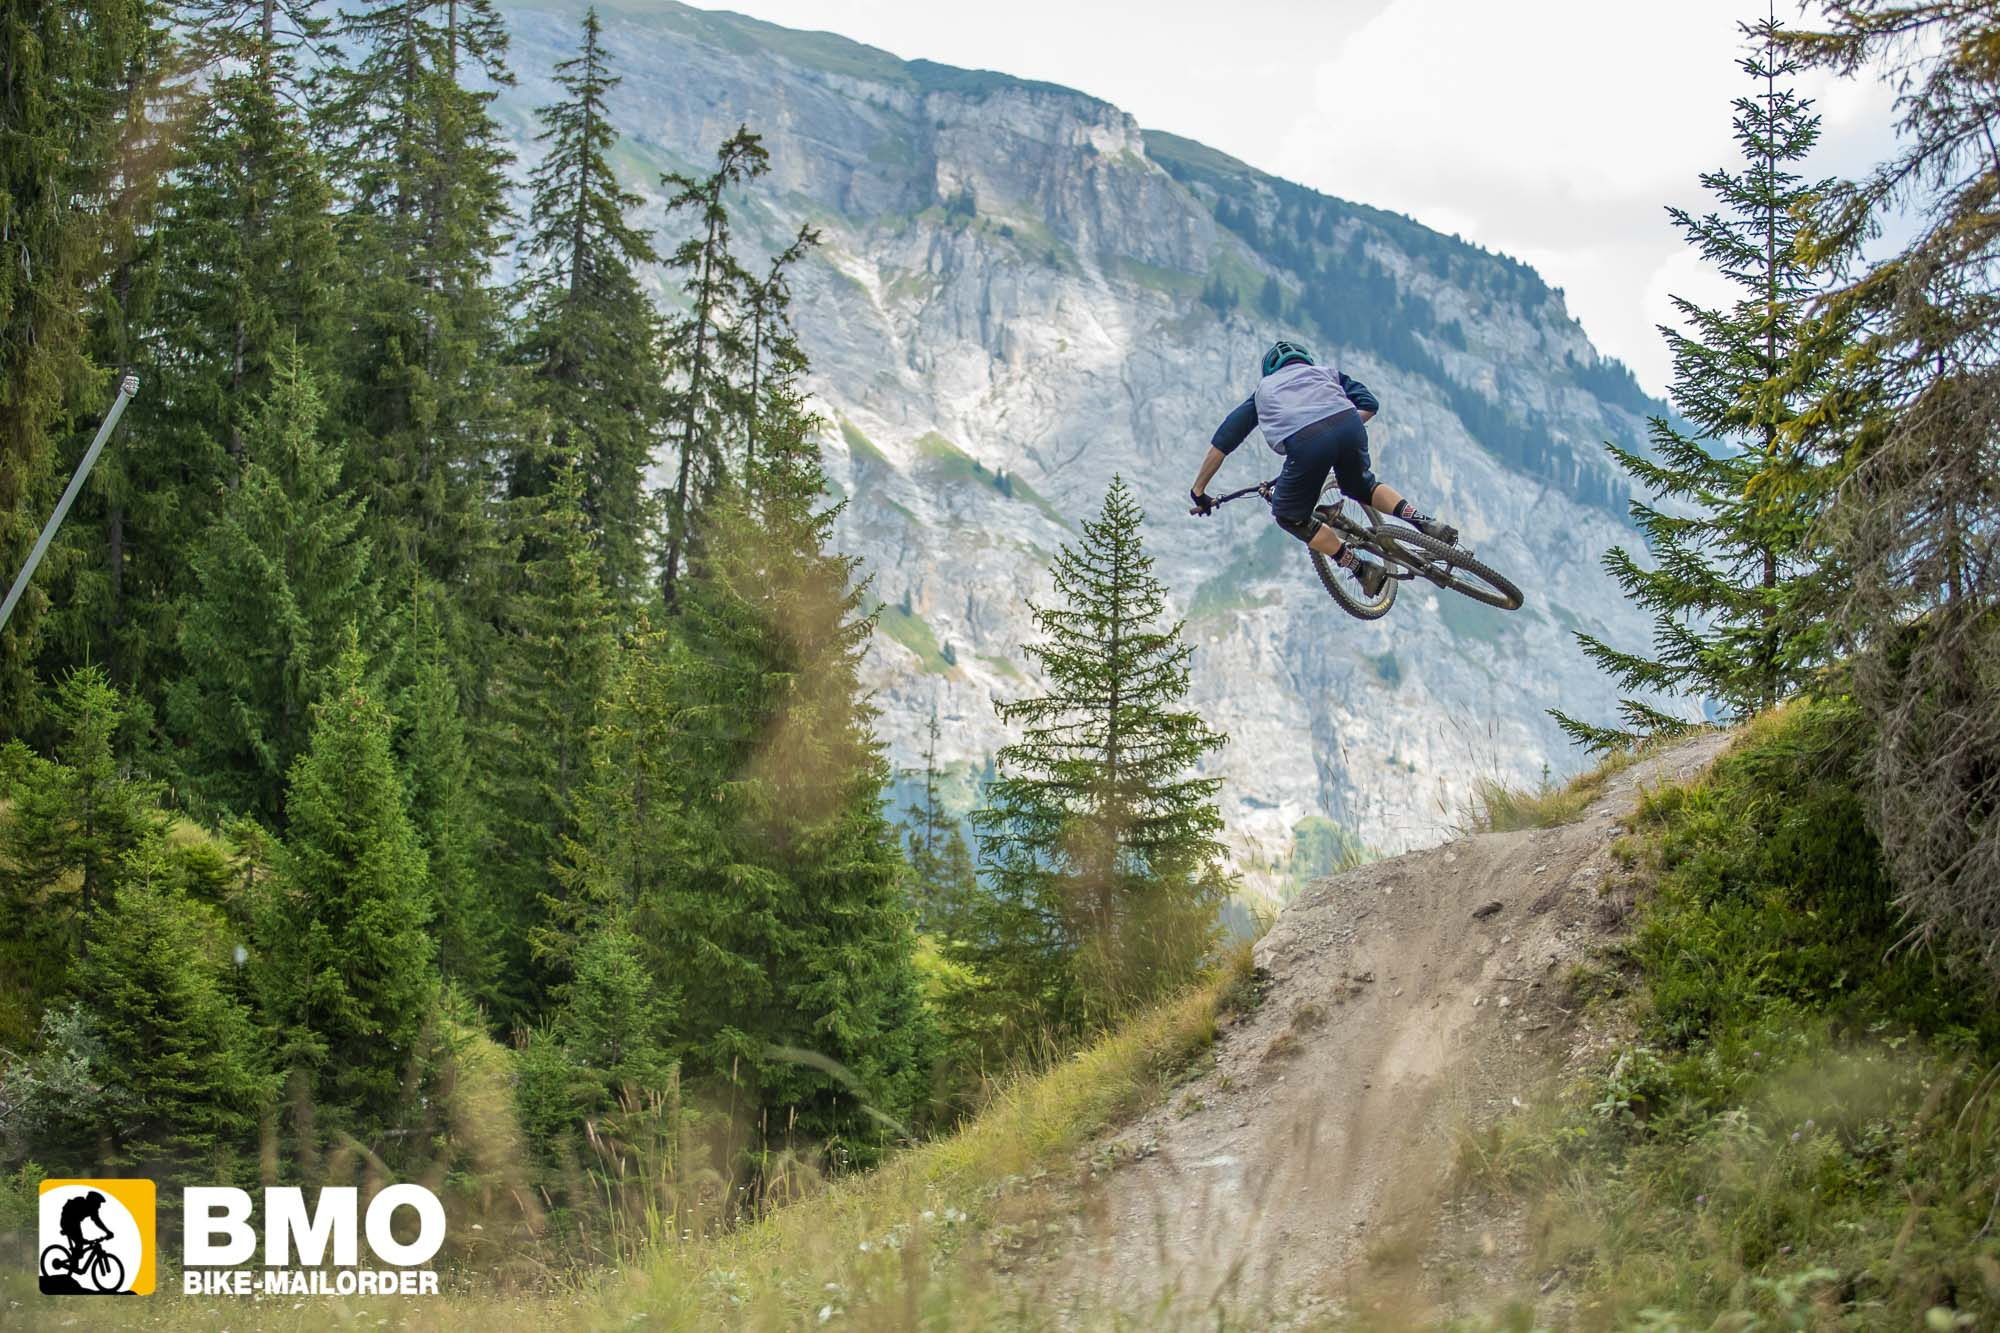 BMO-Bike-Mailorder-Fox-Proframe-4